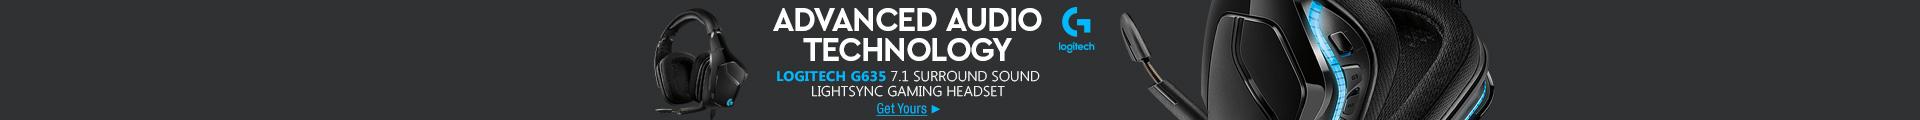 ADVANCED AUDIO TECHNOLOGY